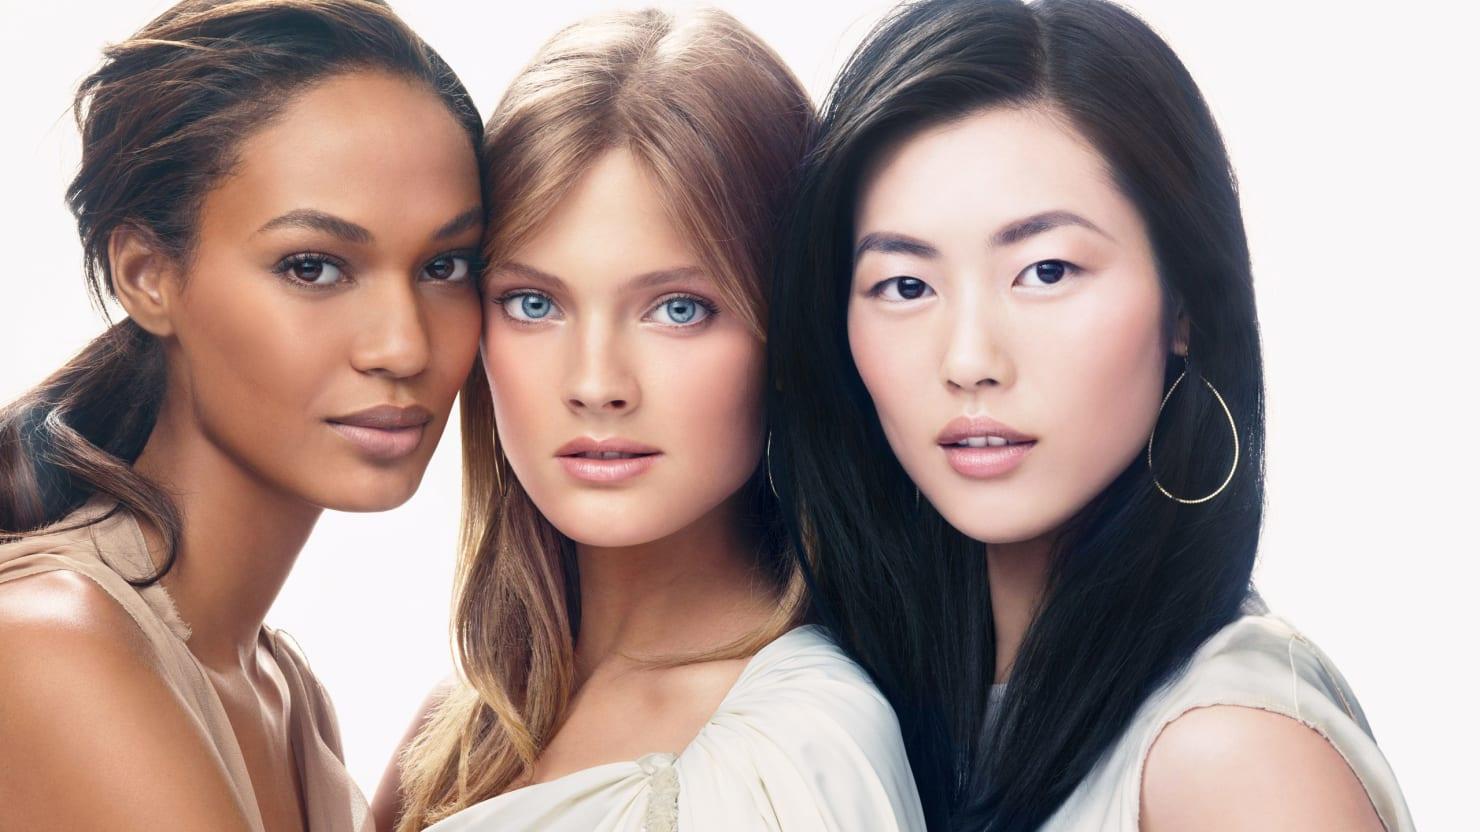 This 3-D Printer Can Change Fashion's Diversity Problem